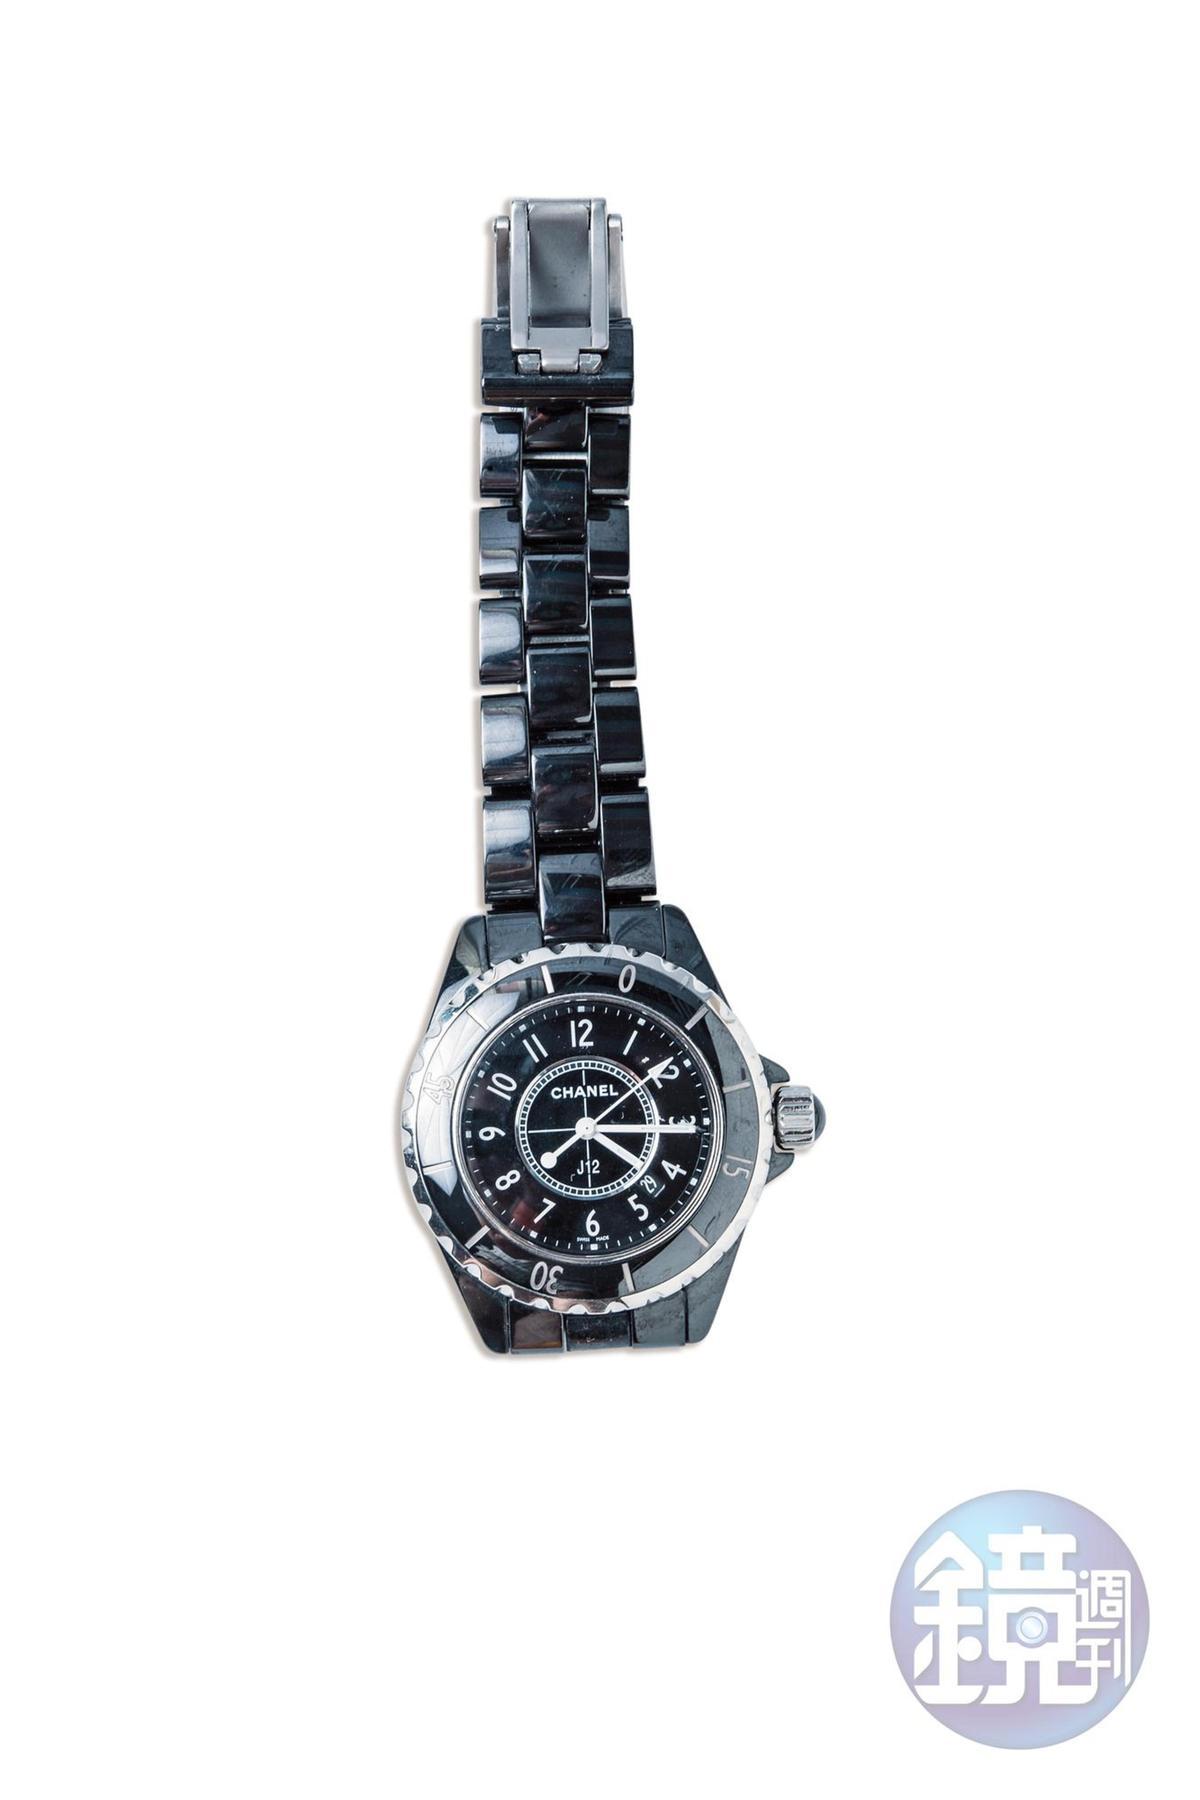 CHANEL J12手錶。老公送的25歲生日禮物